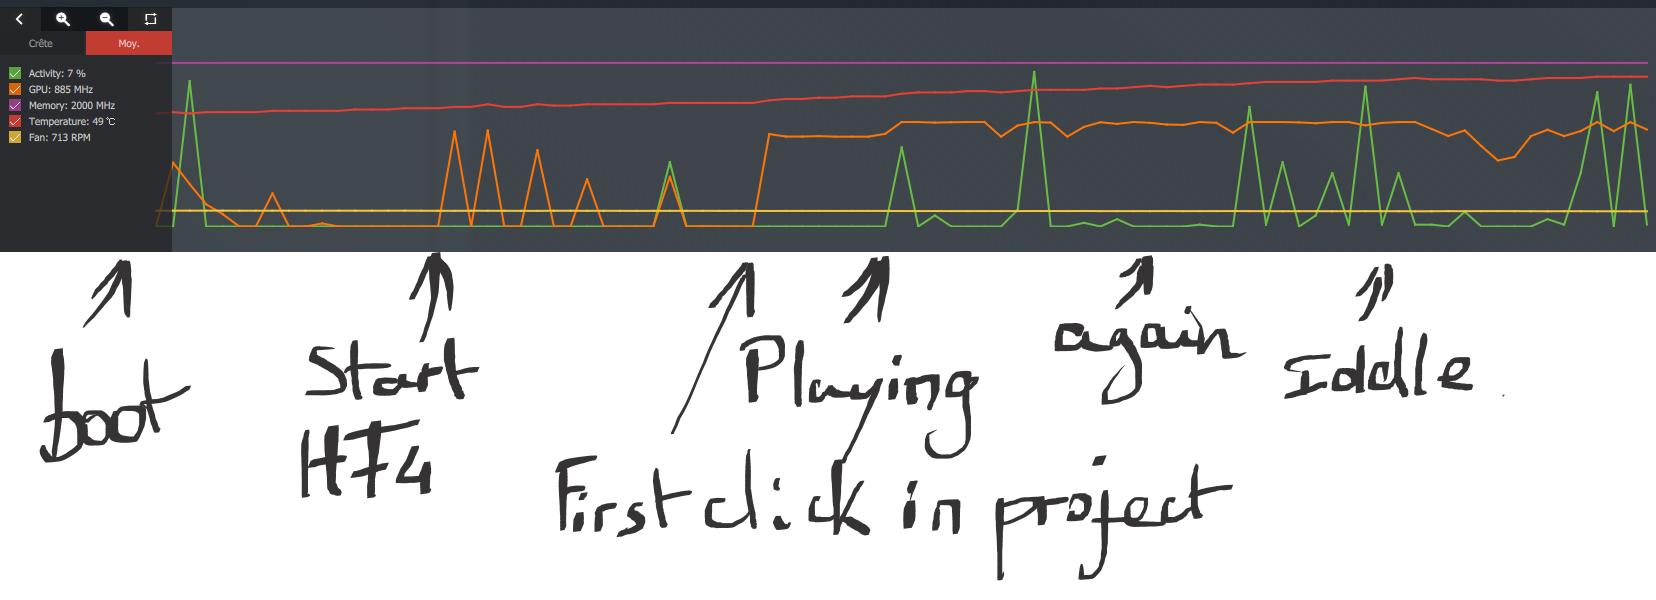 GPU usage view